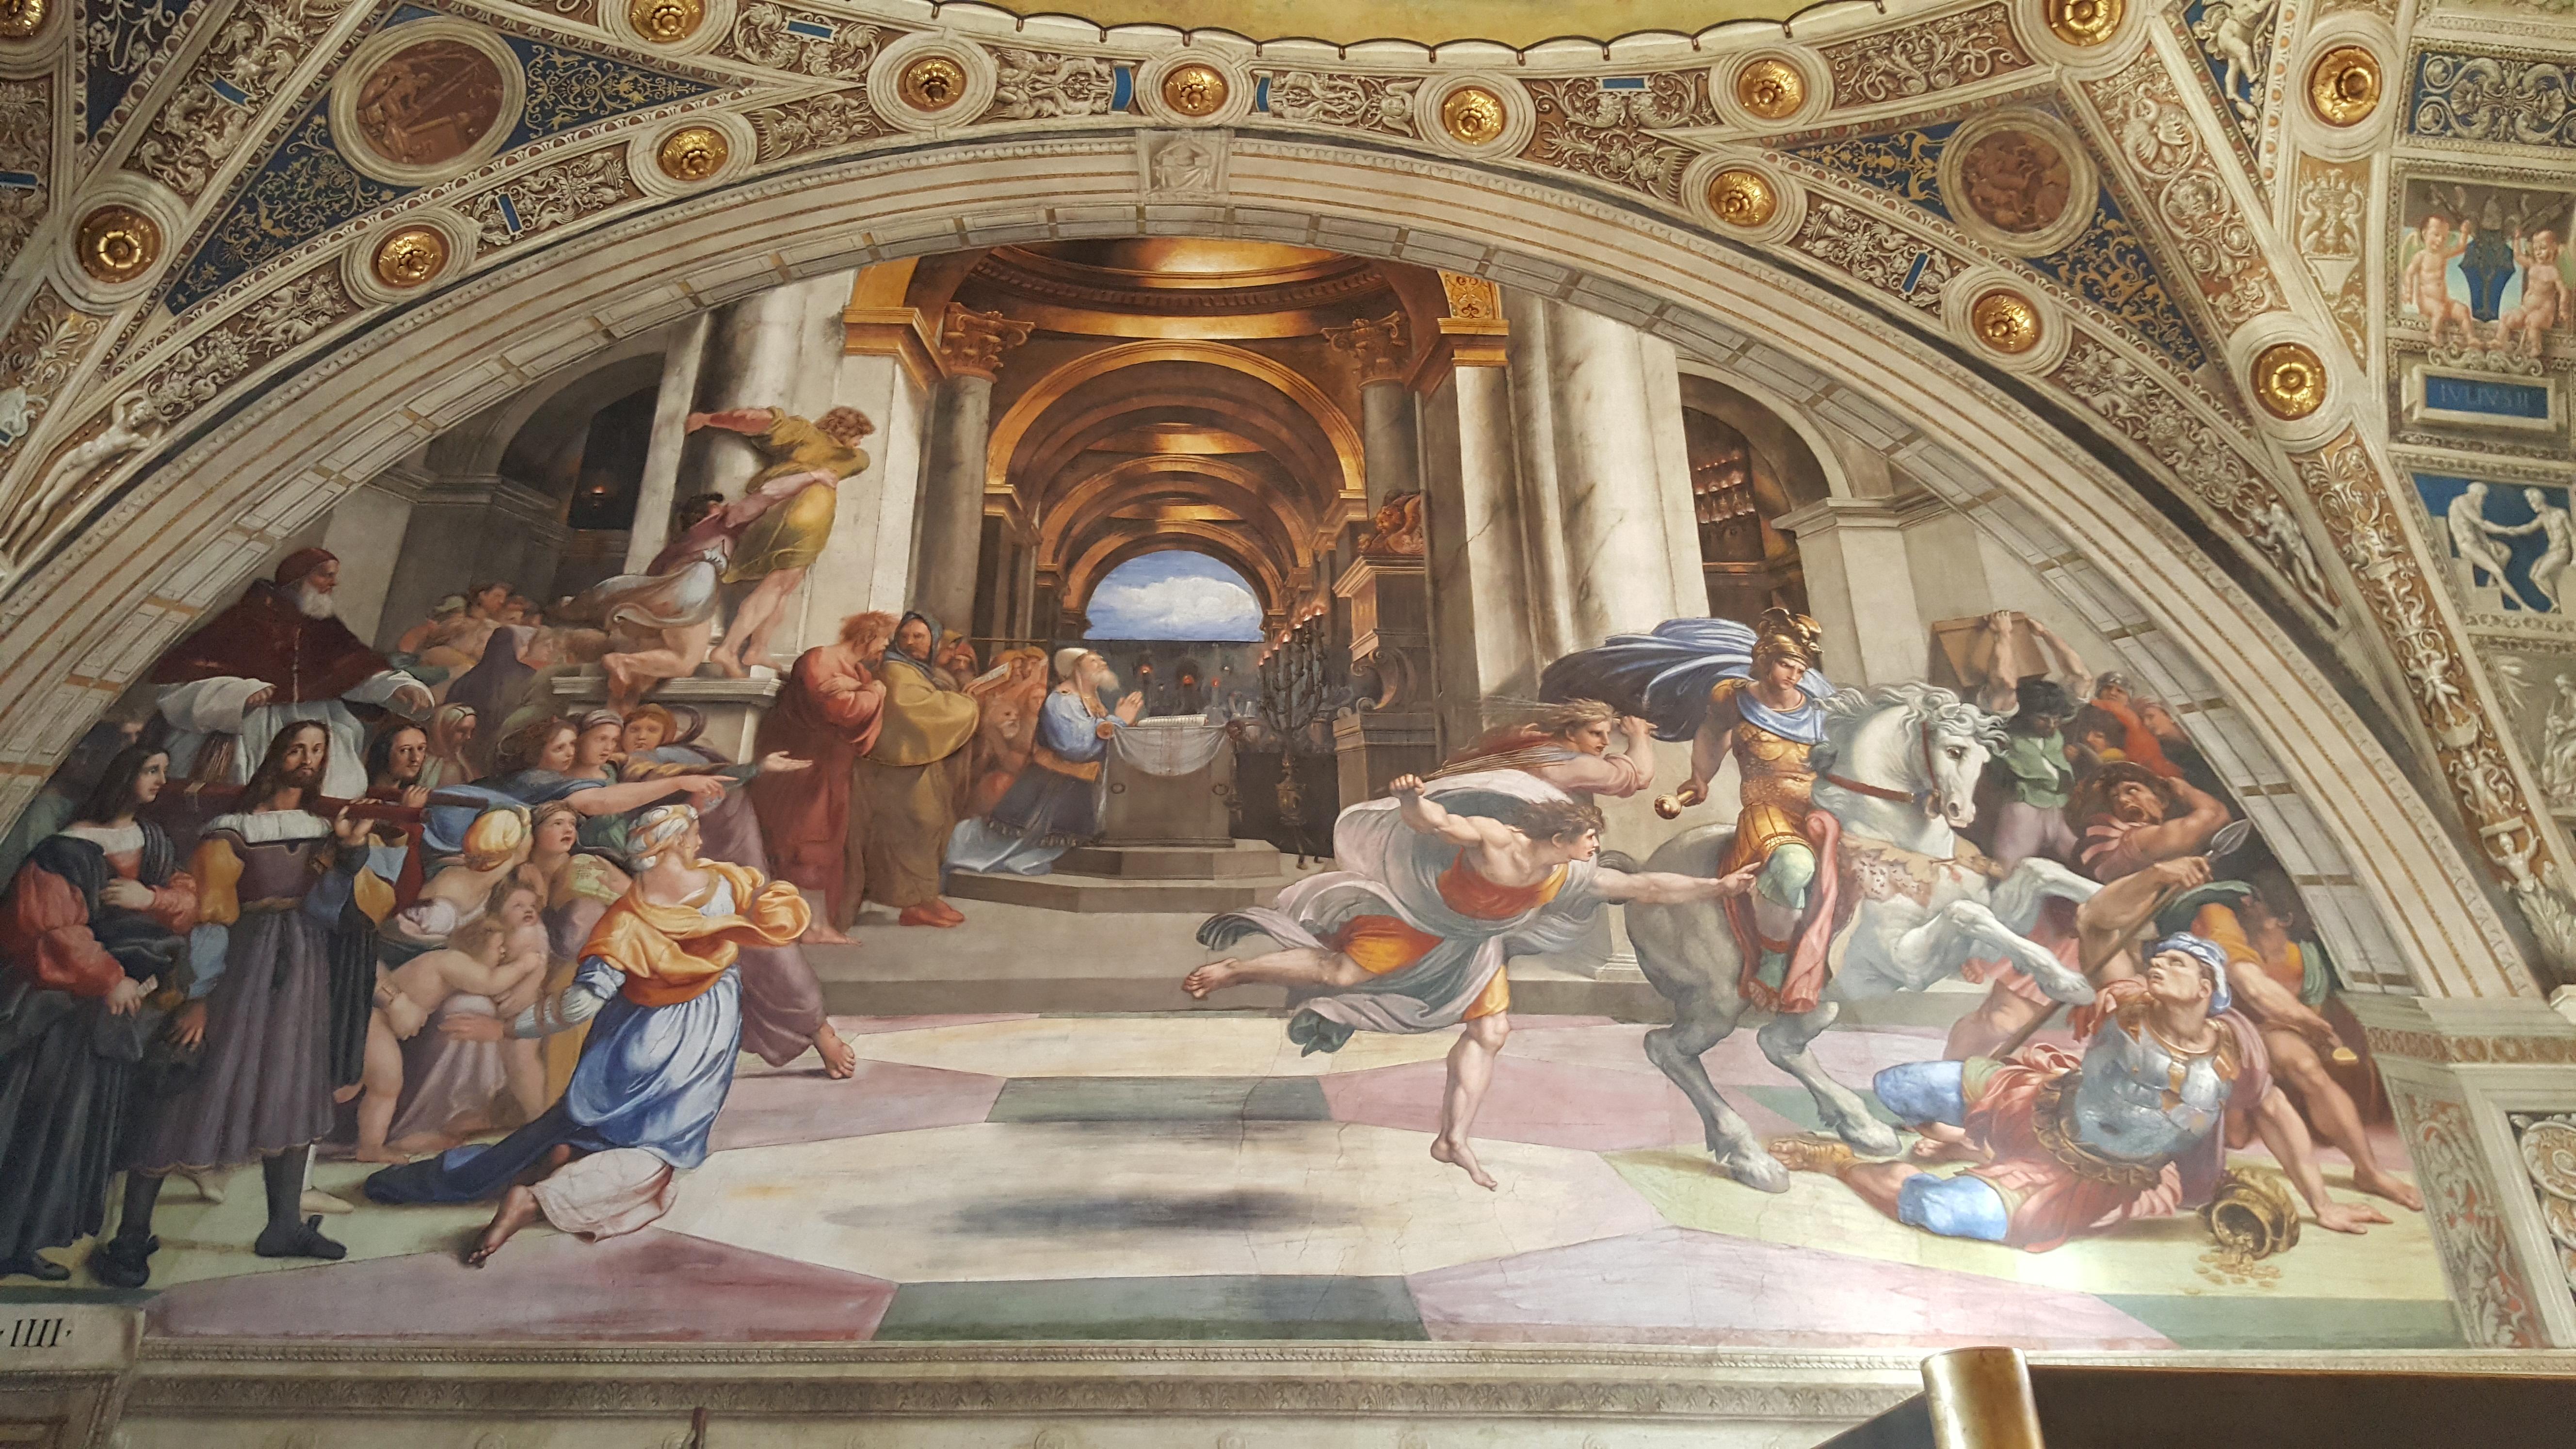 Фреска работы Рафаэля